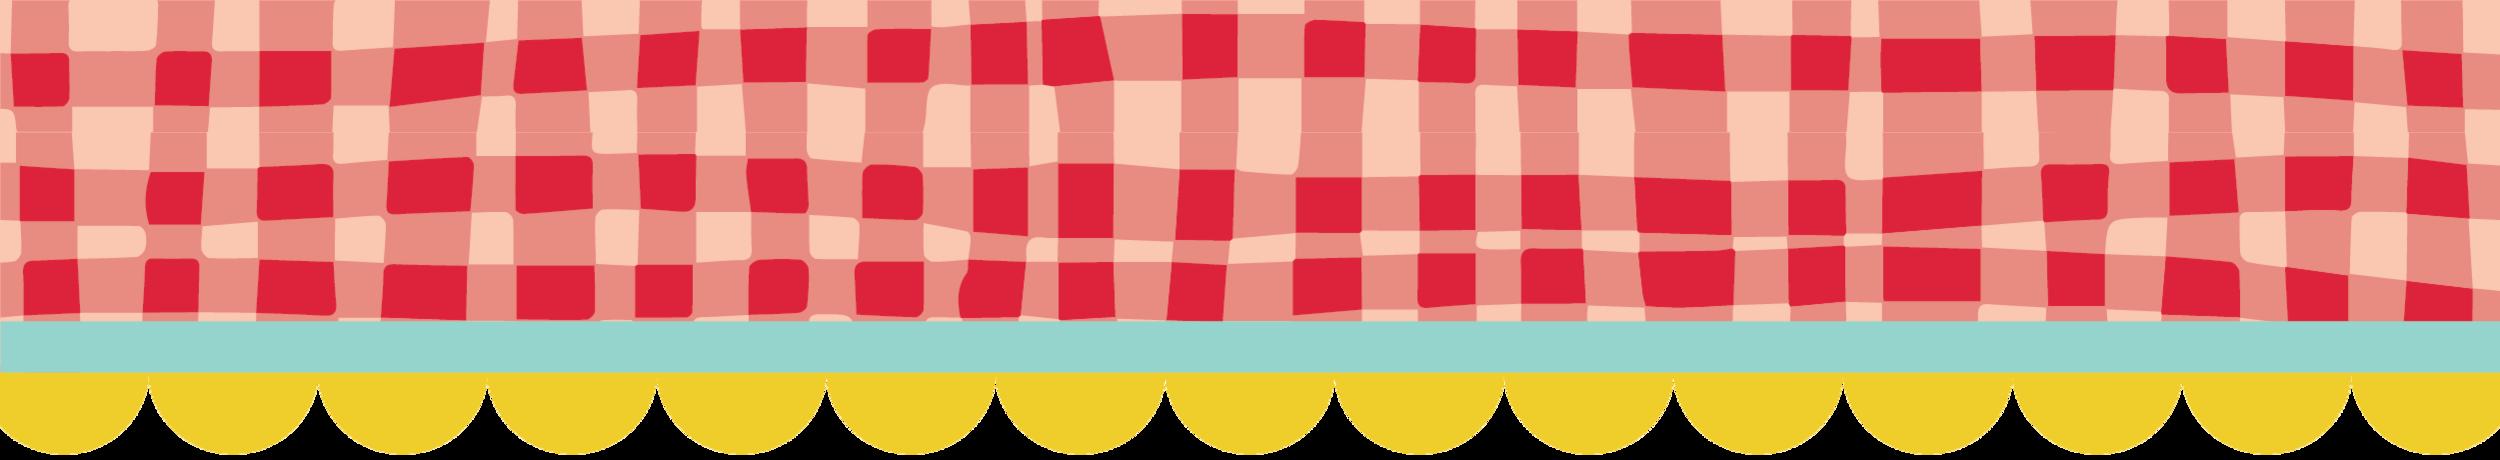 CaseStudyBrandBoard_JuneClever_Template_Intro Pattern.png